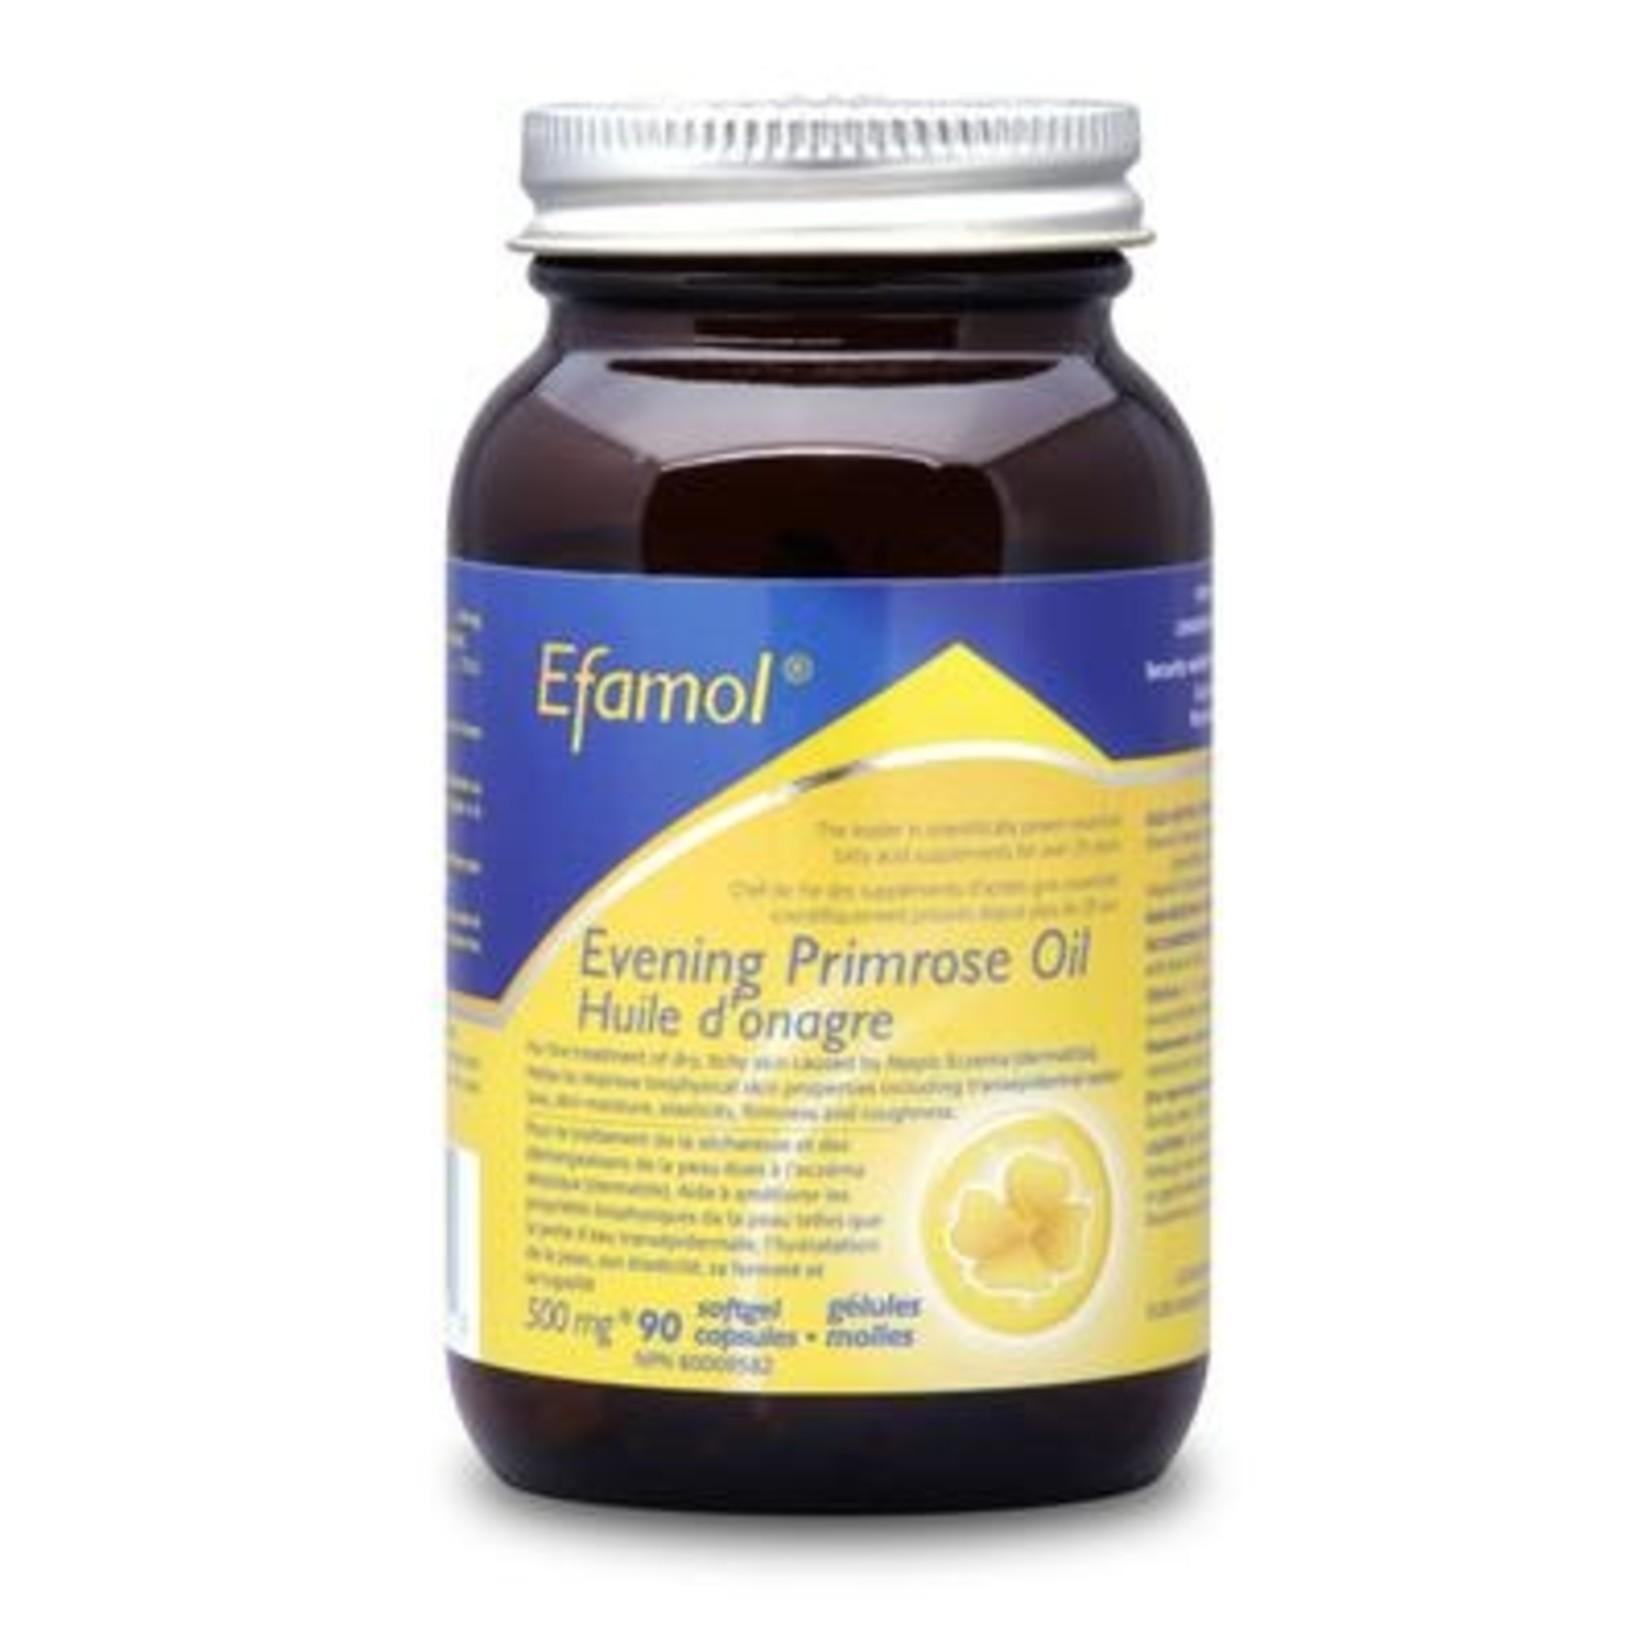 Flora Efamol Beautiful-Skin Evening Primrose Oil 1000mg 90SG